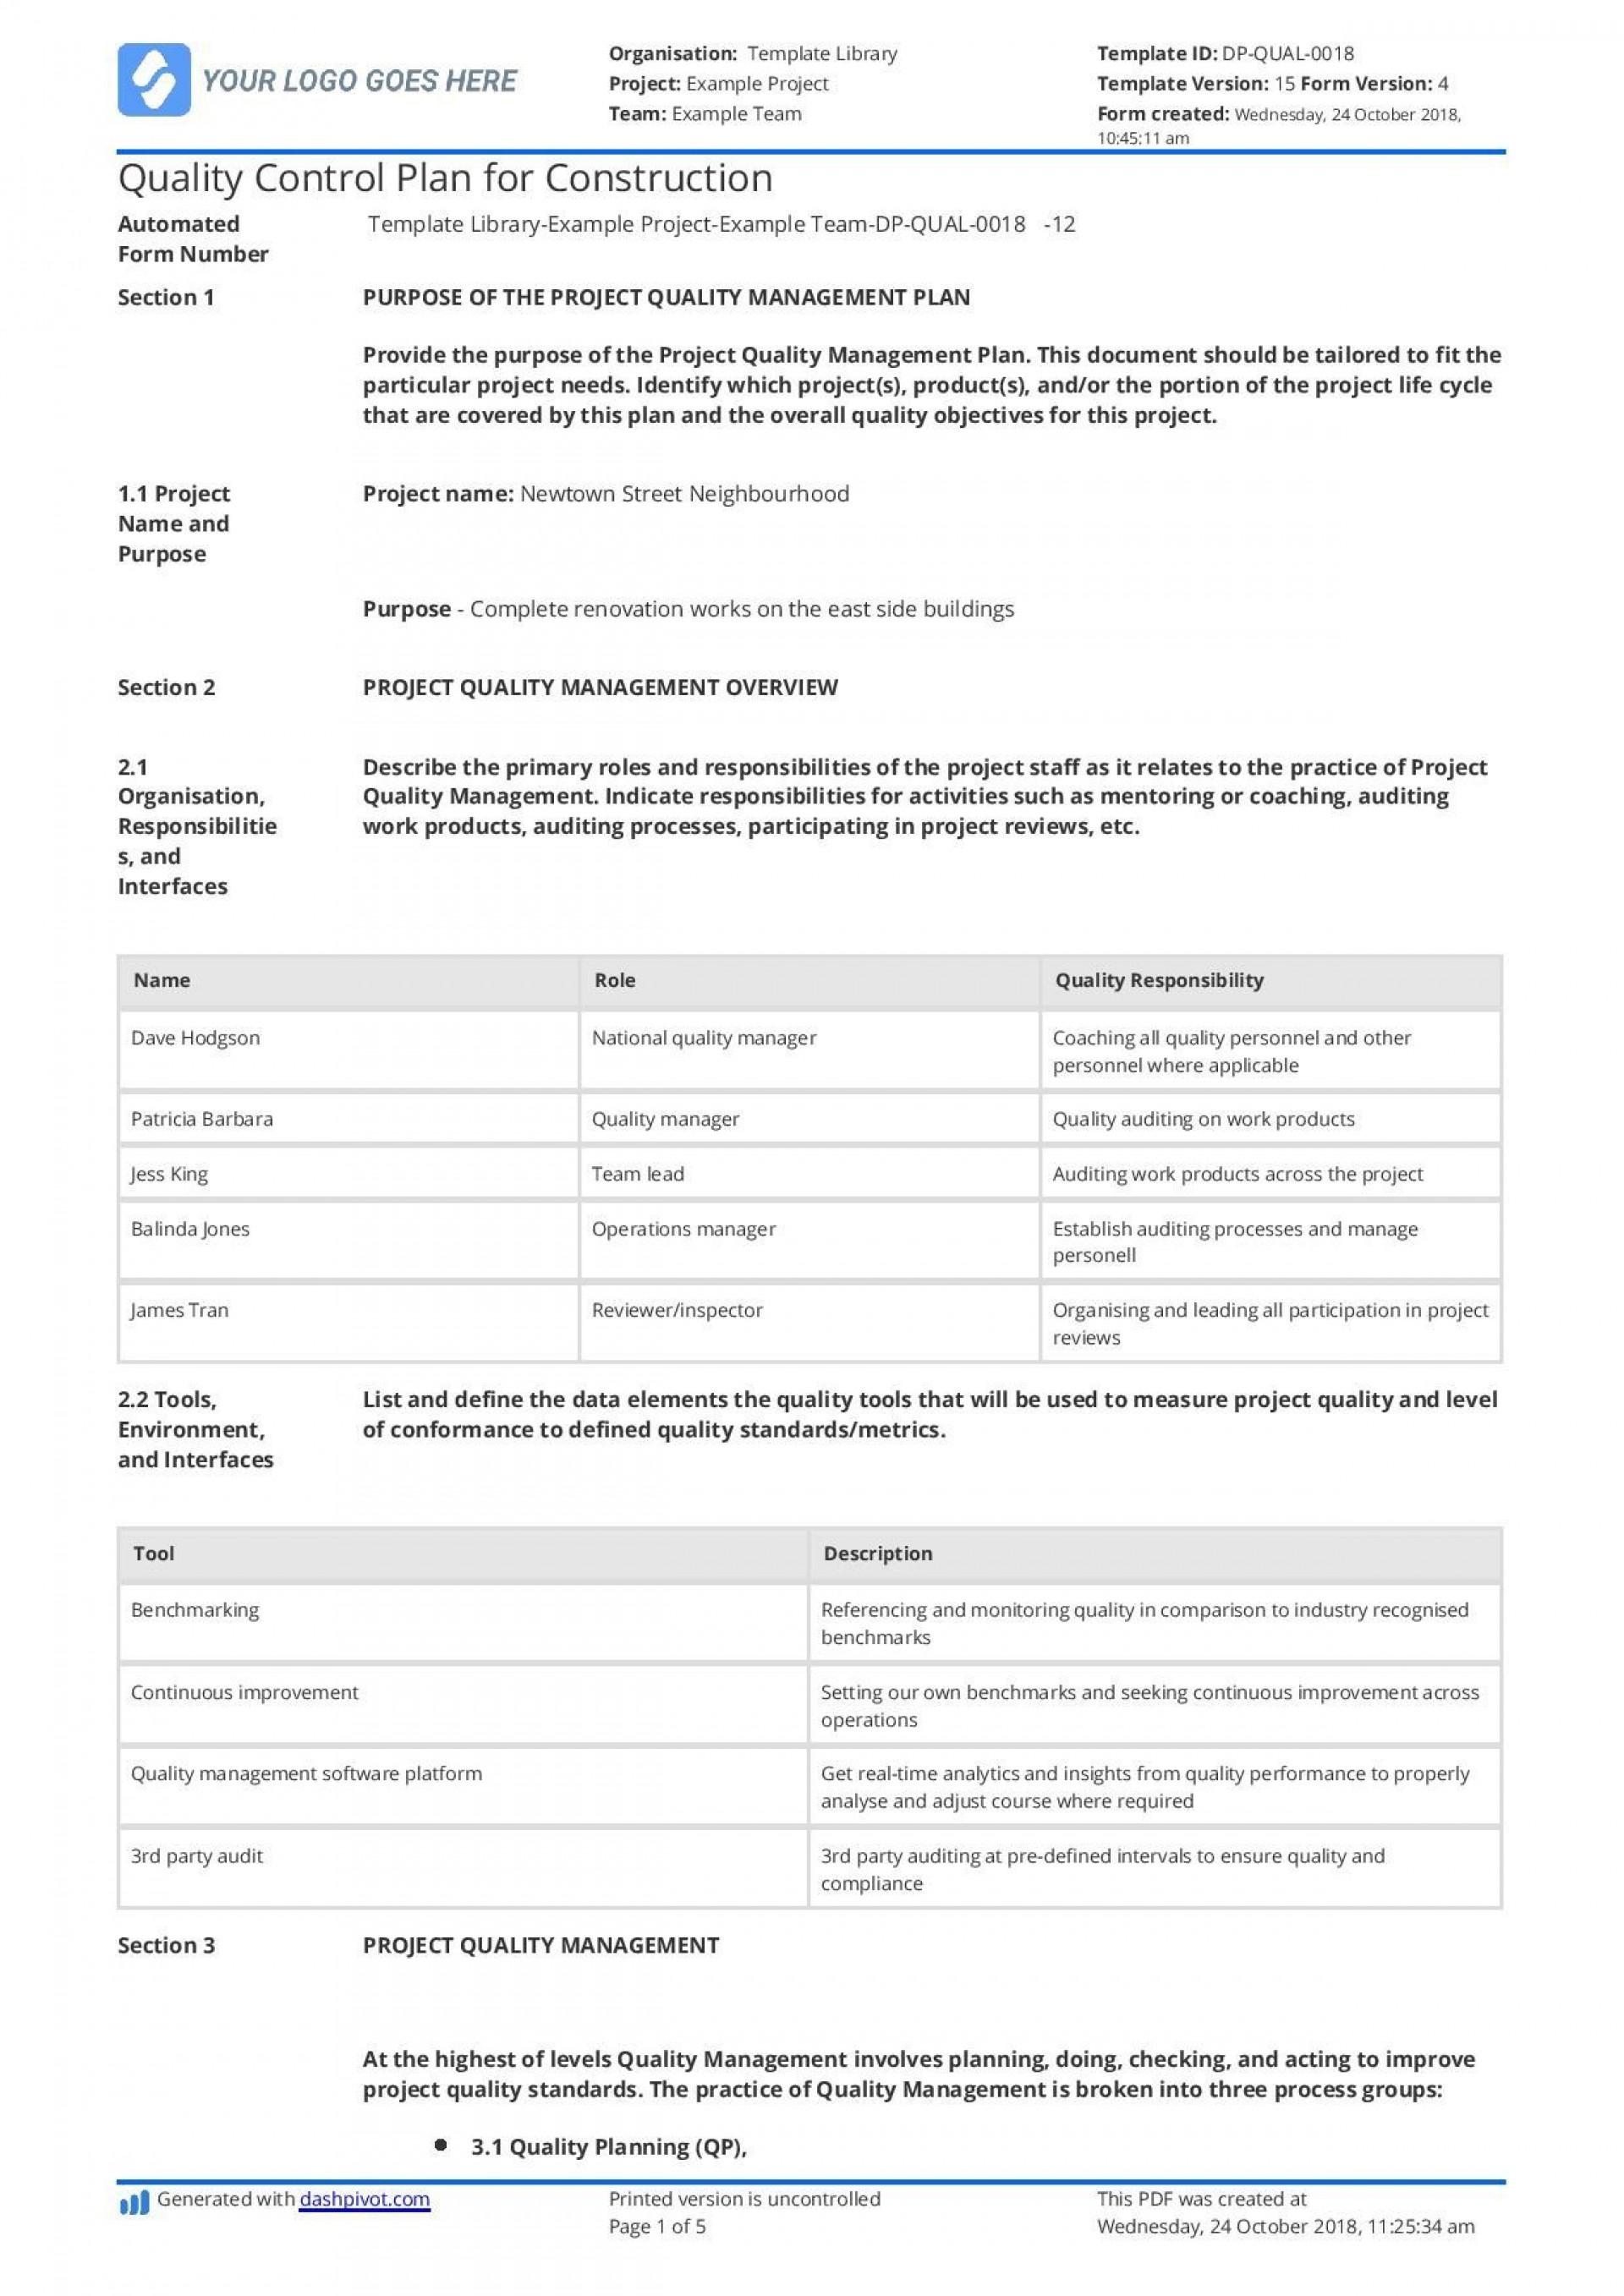 002 Wonderful Construction Project Management Plan Template Word Concept 1920